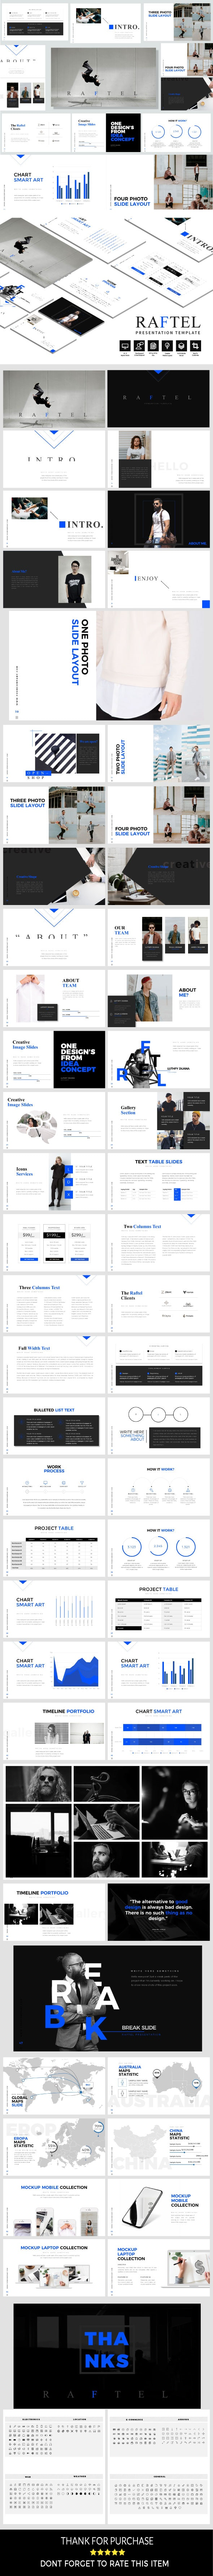 Multipurpose Business Keynote Template - Business Keynote Templates